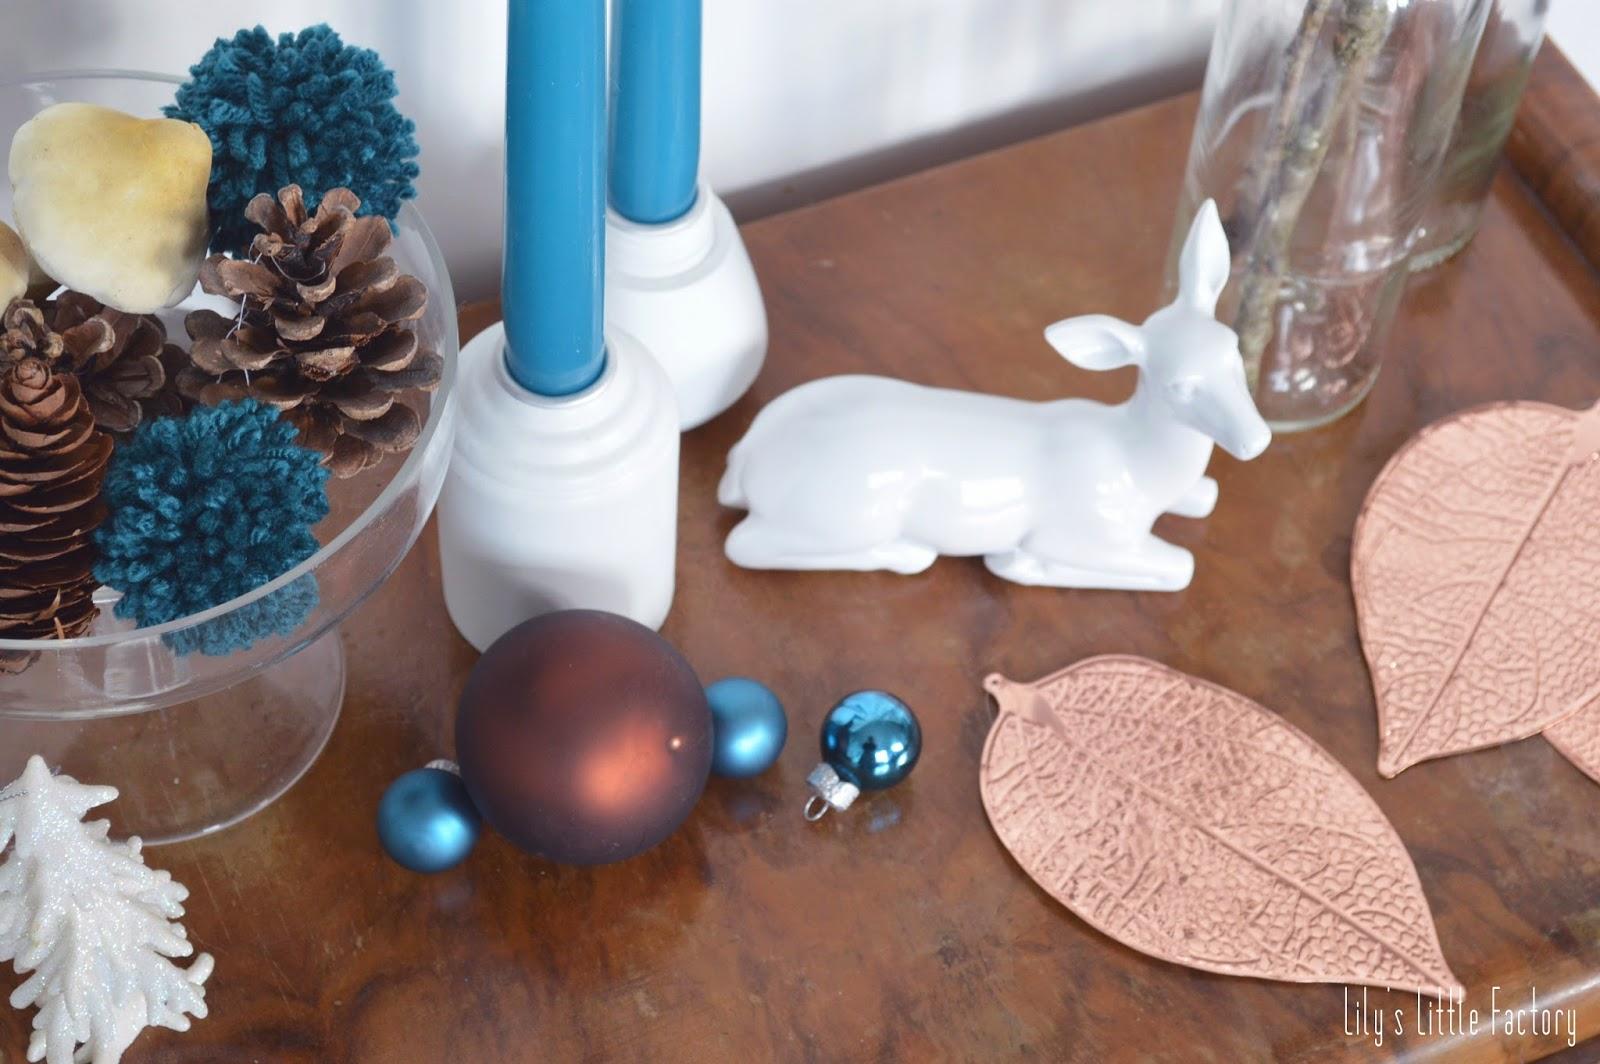 Decoration de noel bleu canard - Sapin decore en bleu ...